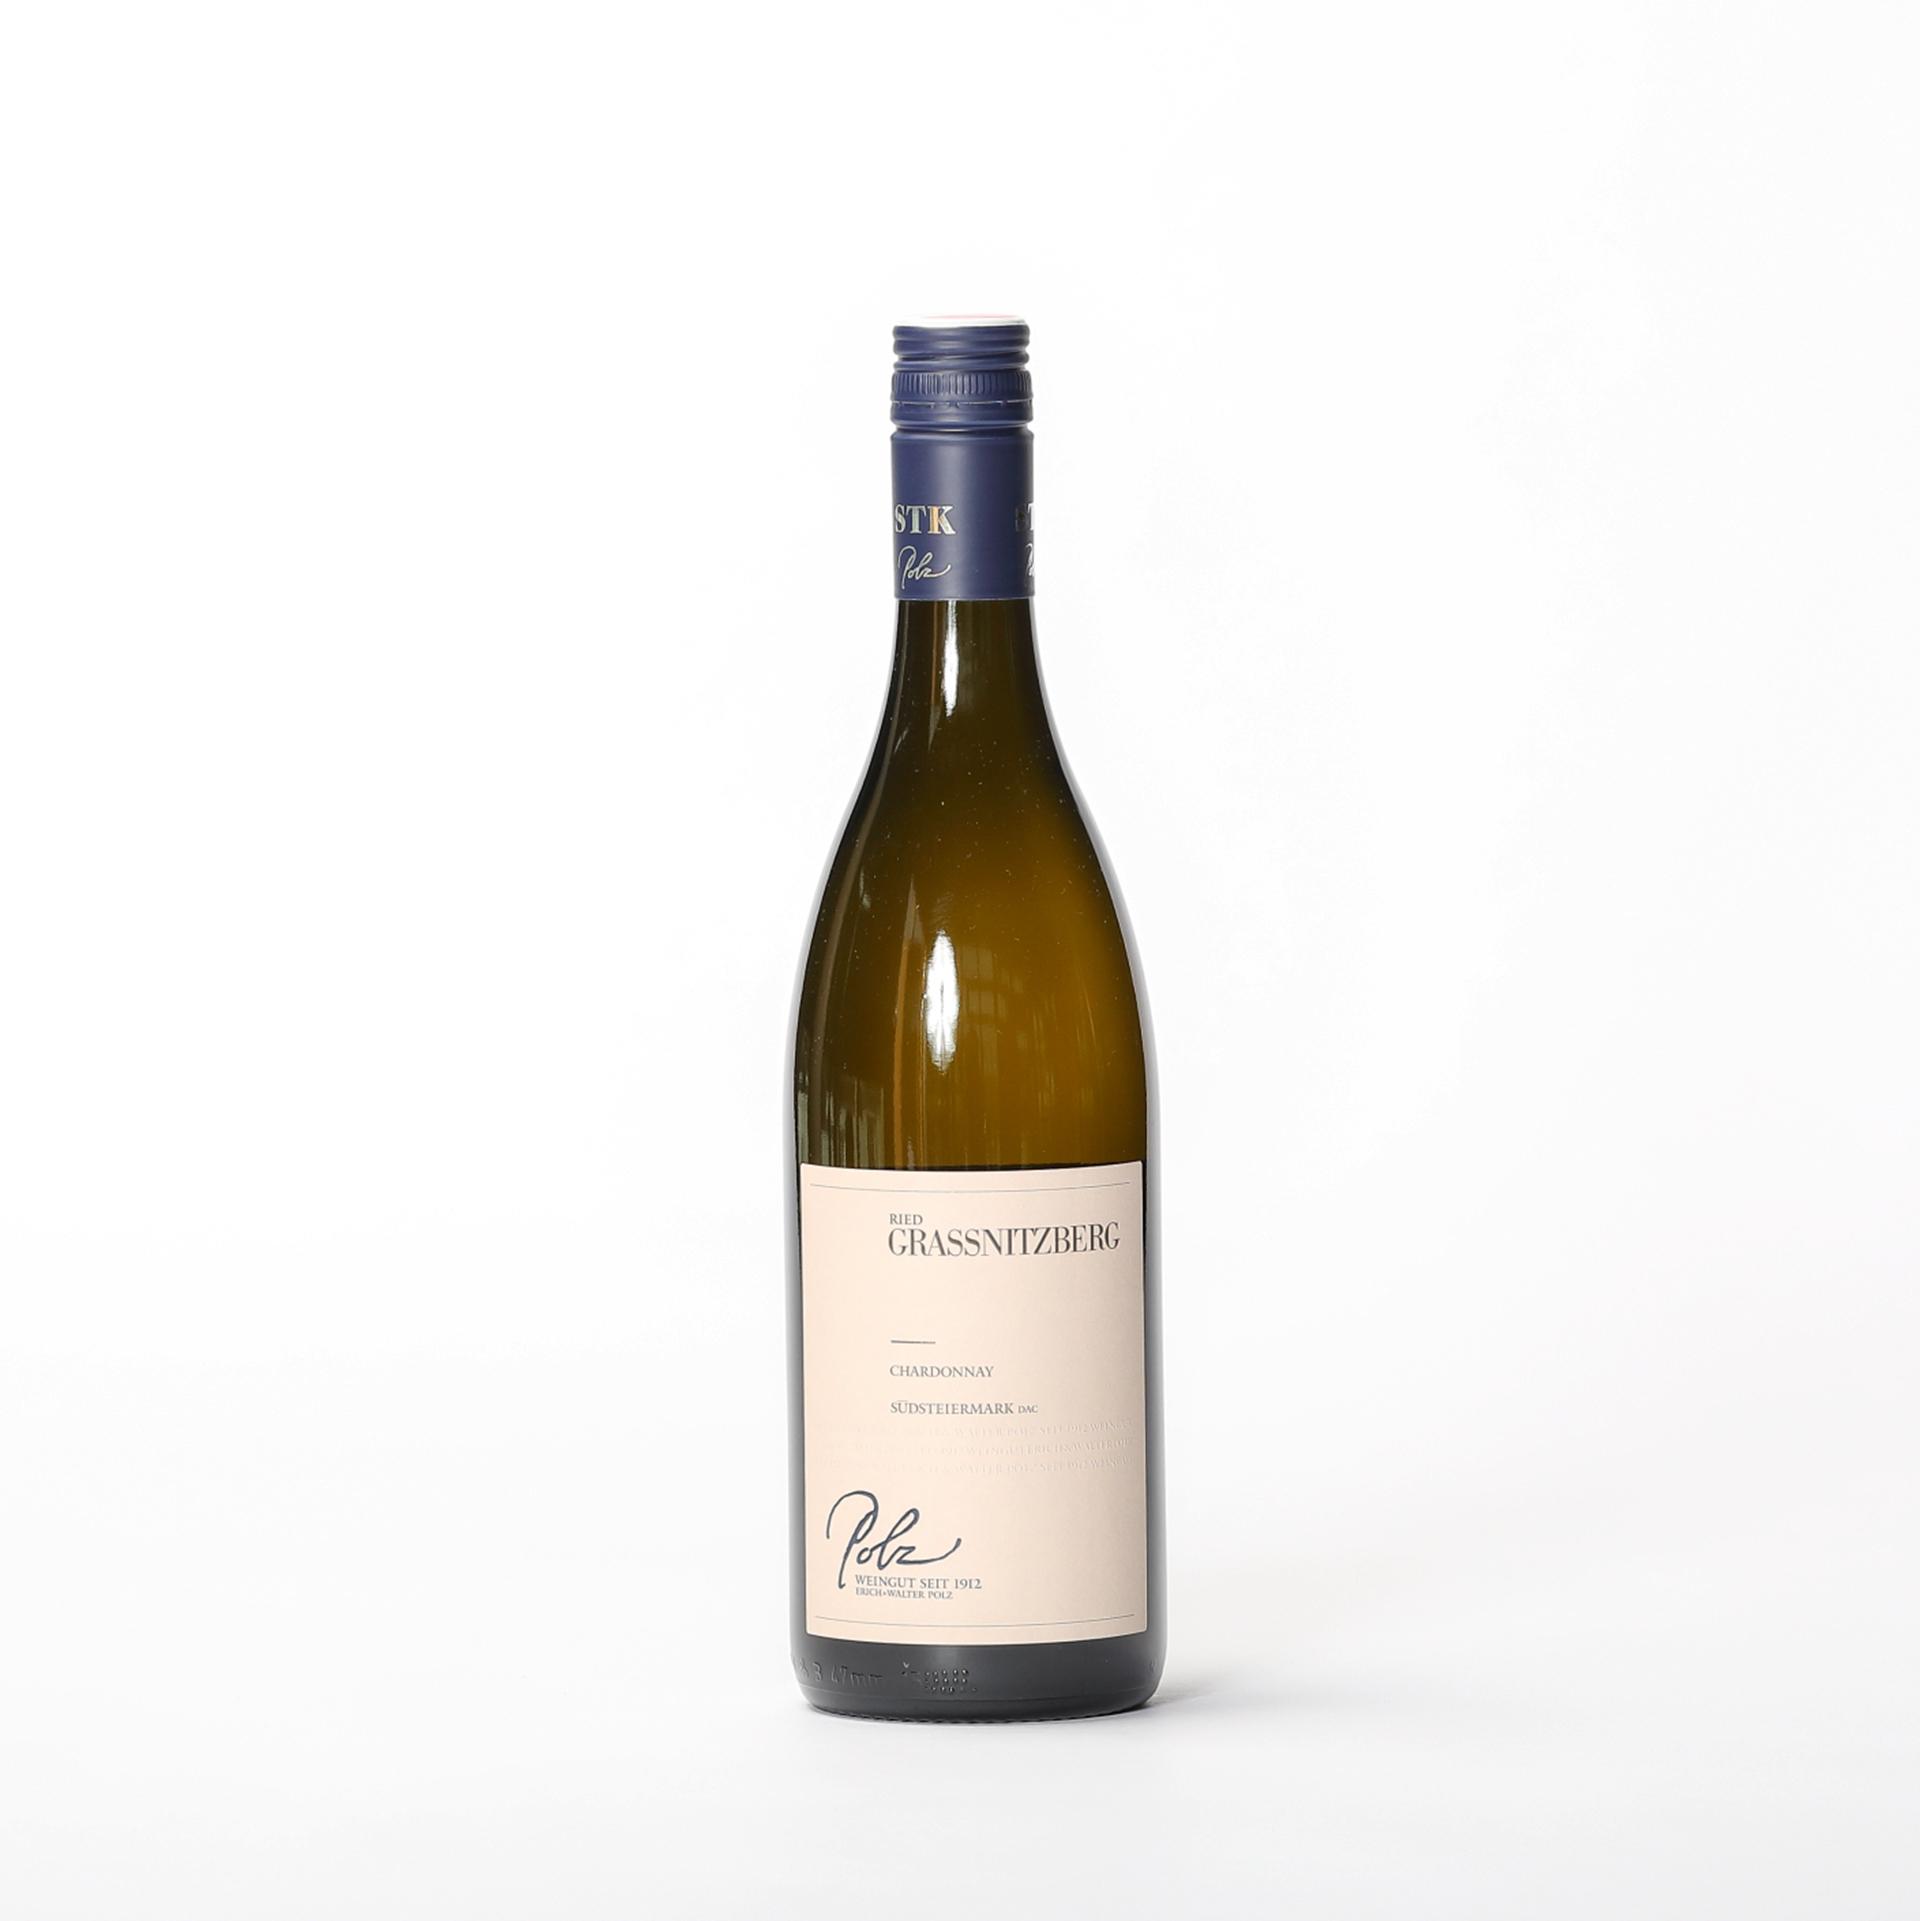 Grassnitzberg Chardonnay 2018 - Weingut Erich & Walter Polz